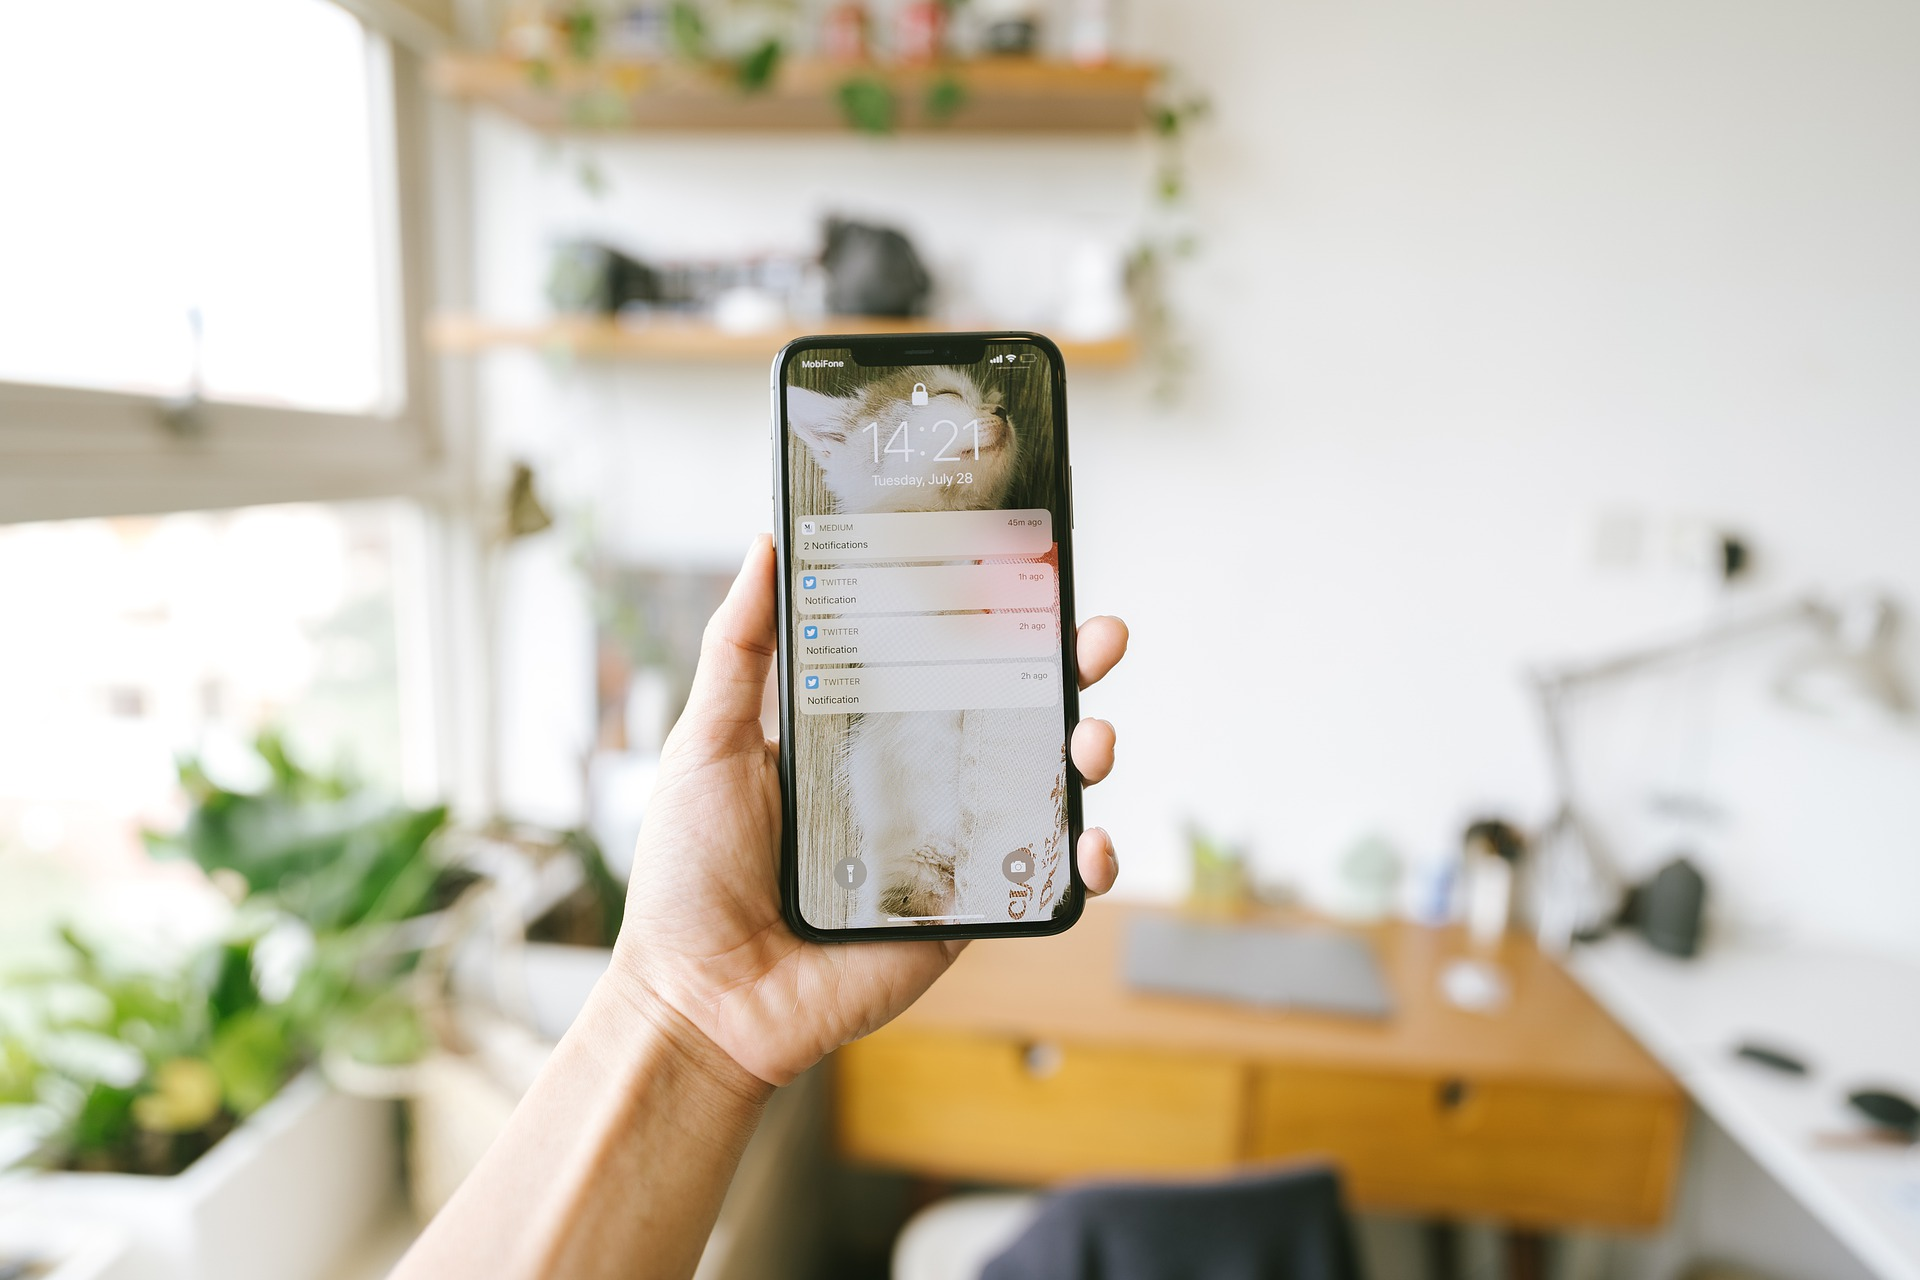 Používáte ochranná skla na telefon?